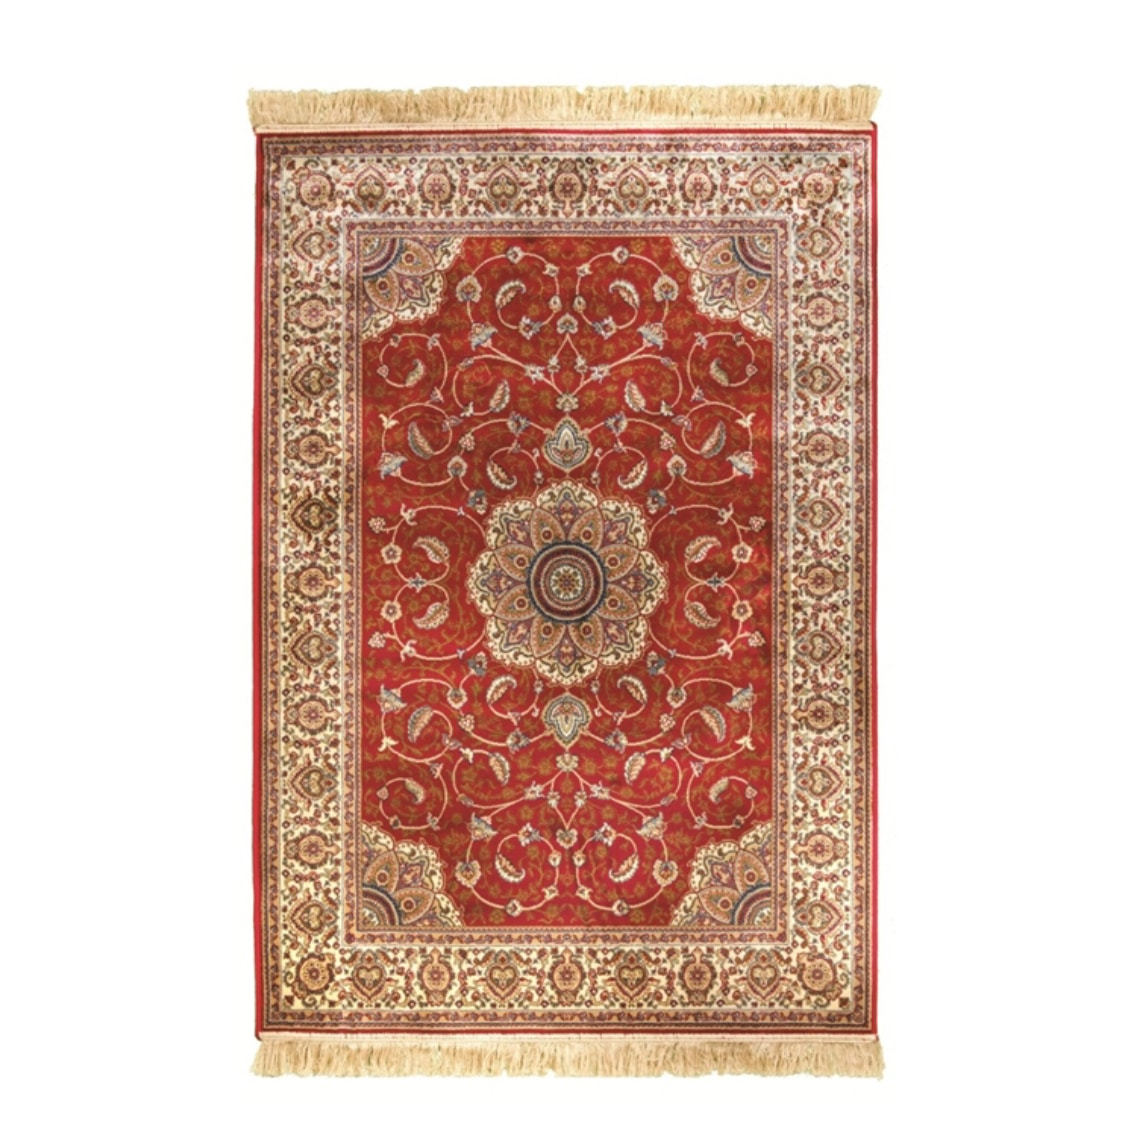 Kashmir Traditional Rug Red Cream Design Duffys